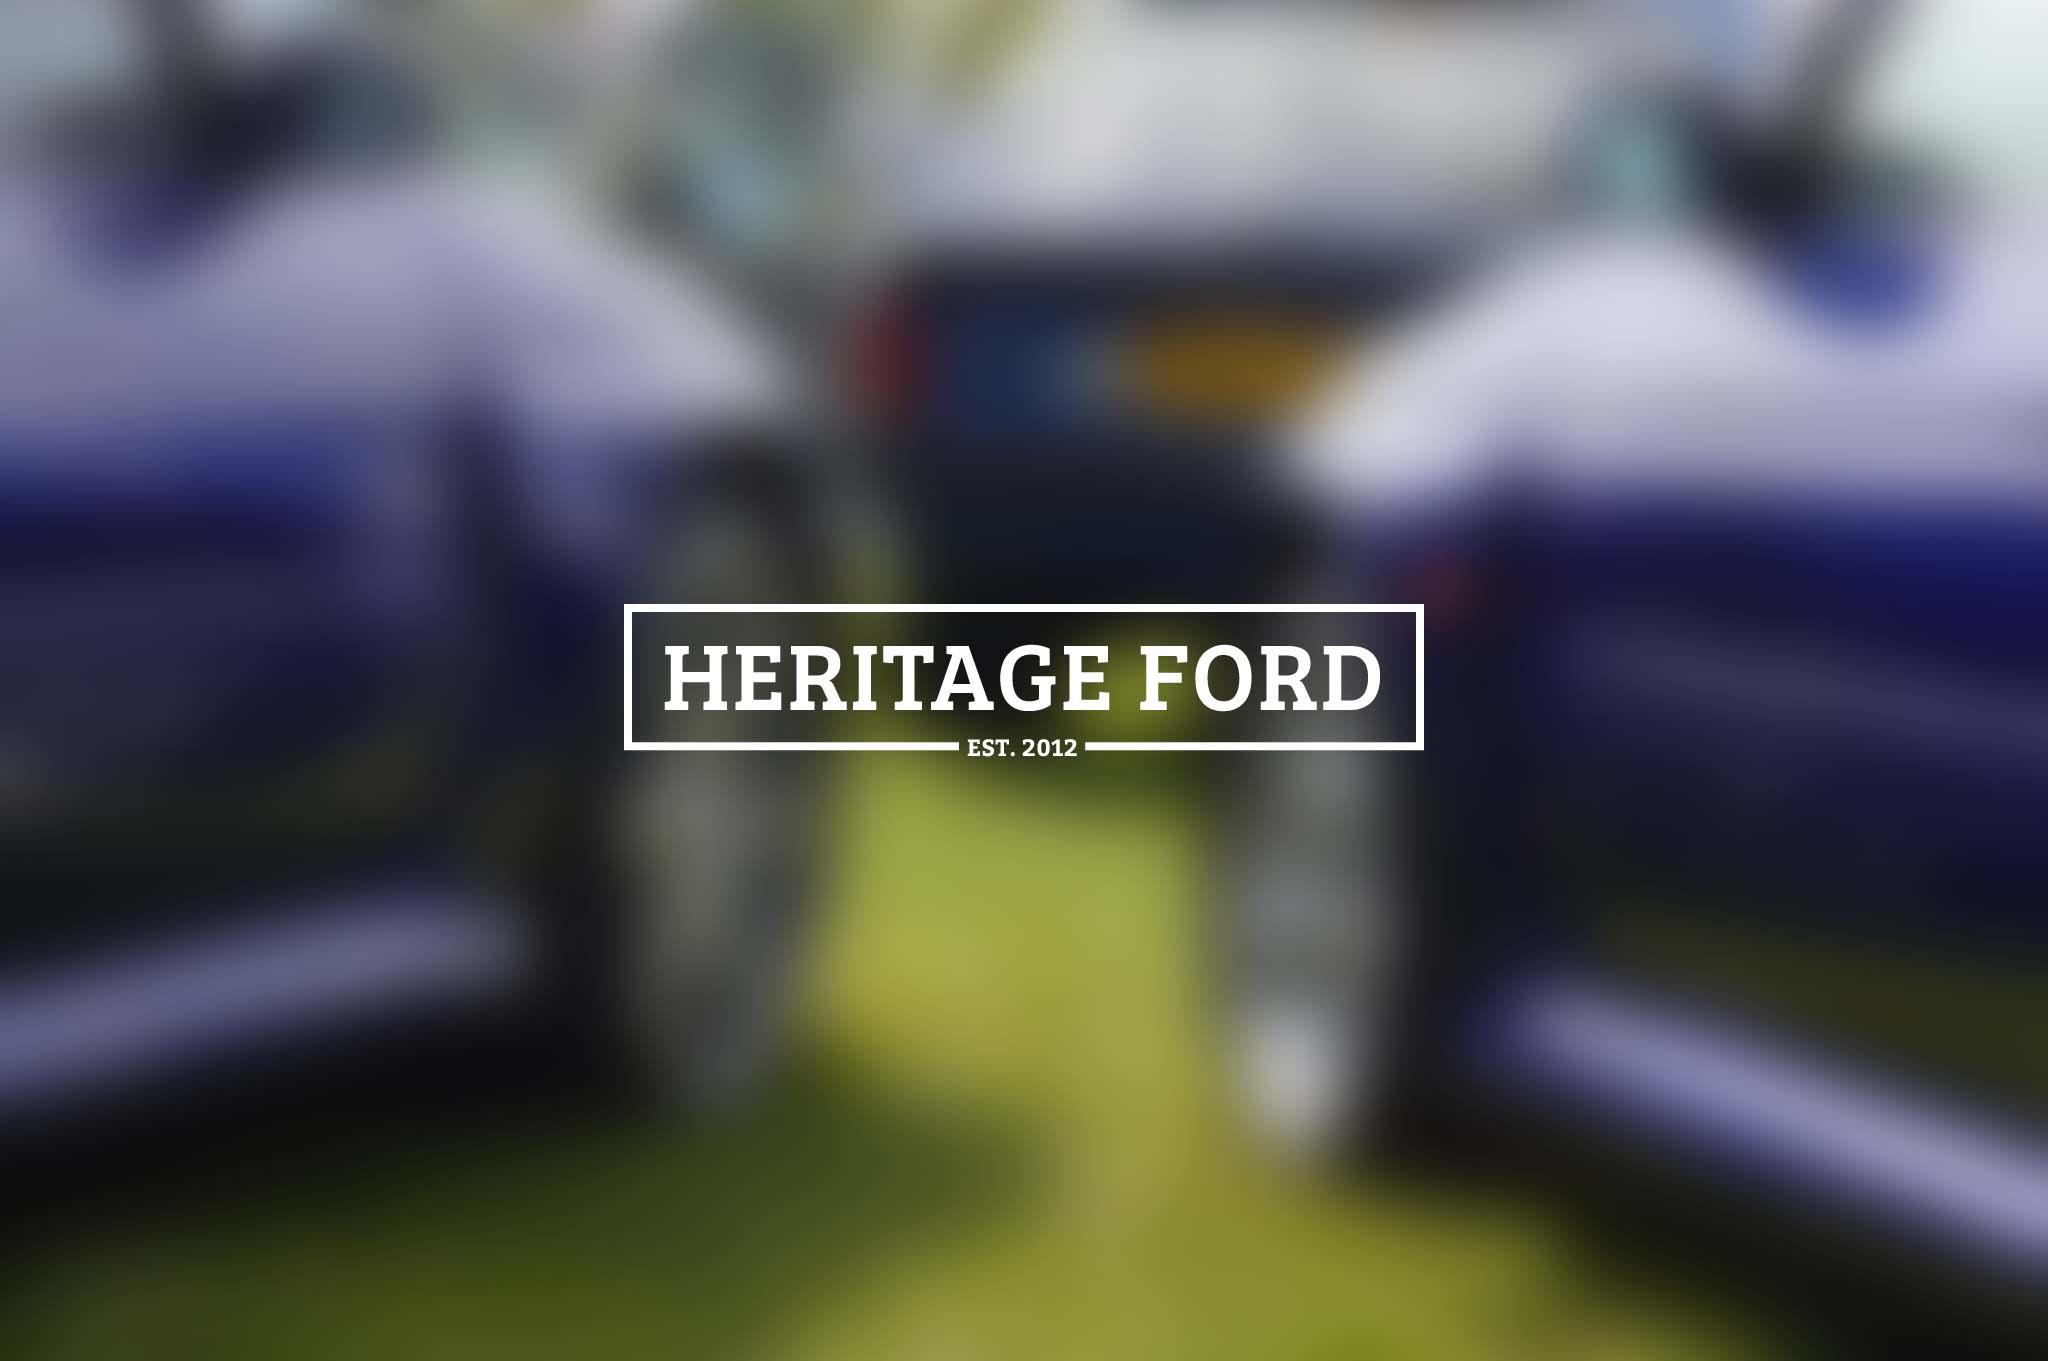 HeritageFord logo